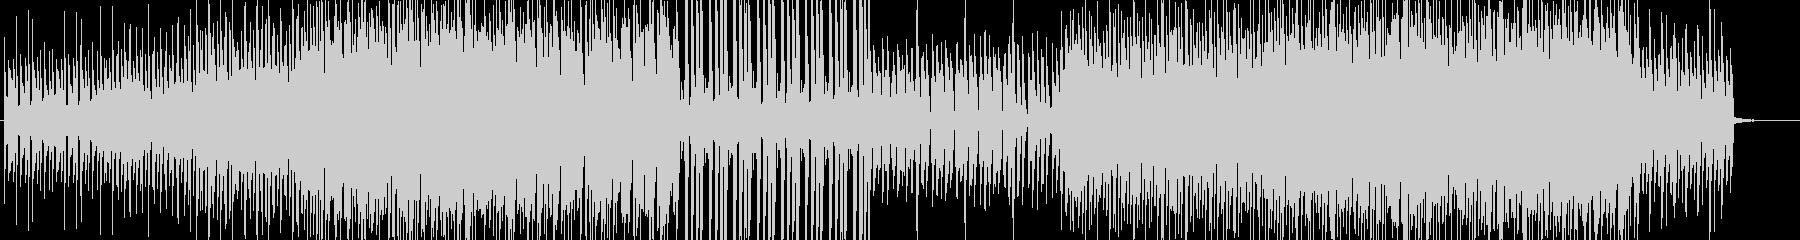 PV-星空★-ダンスポップ・エレクトロの未再生の波形